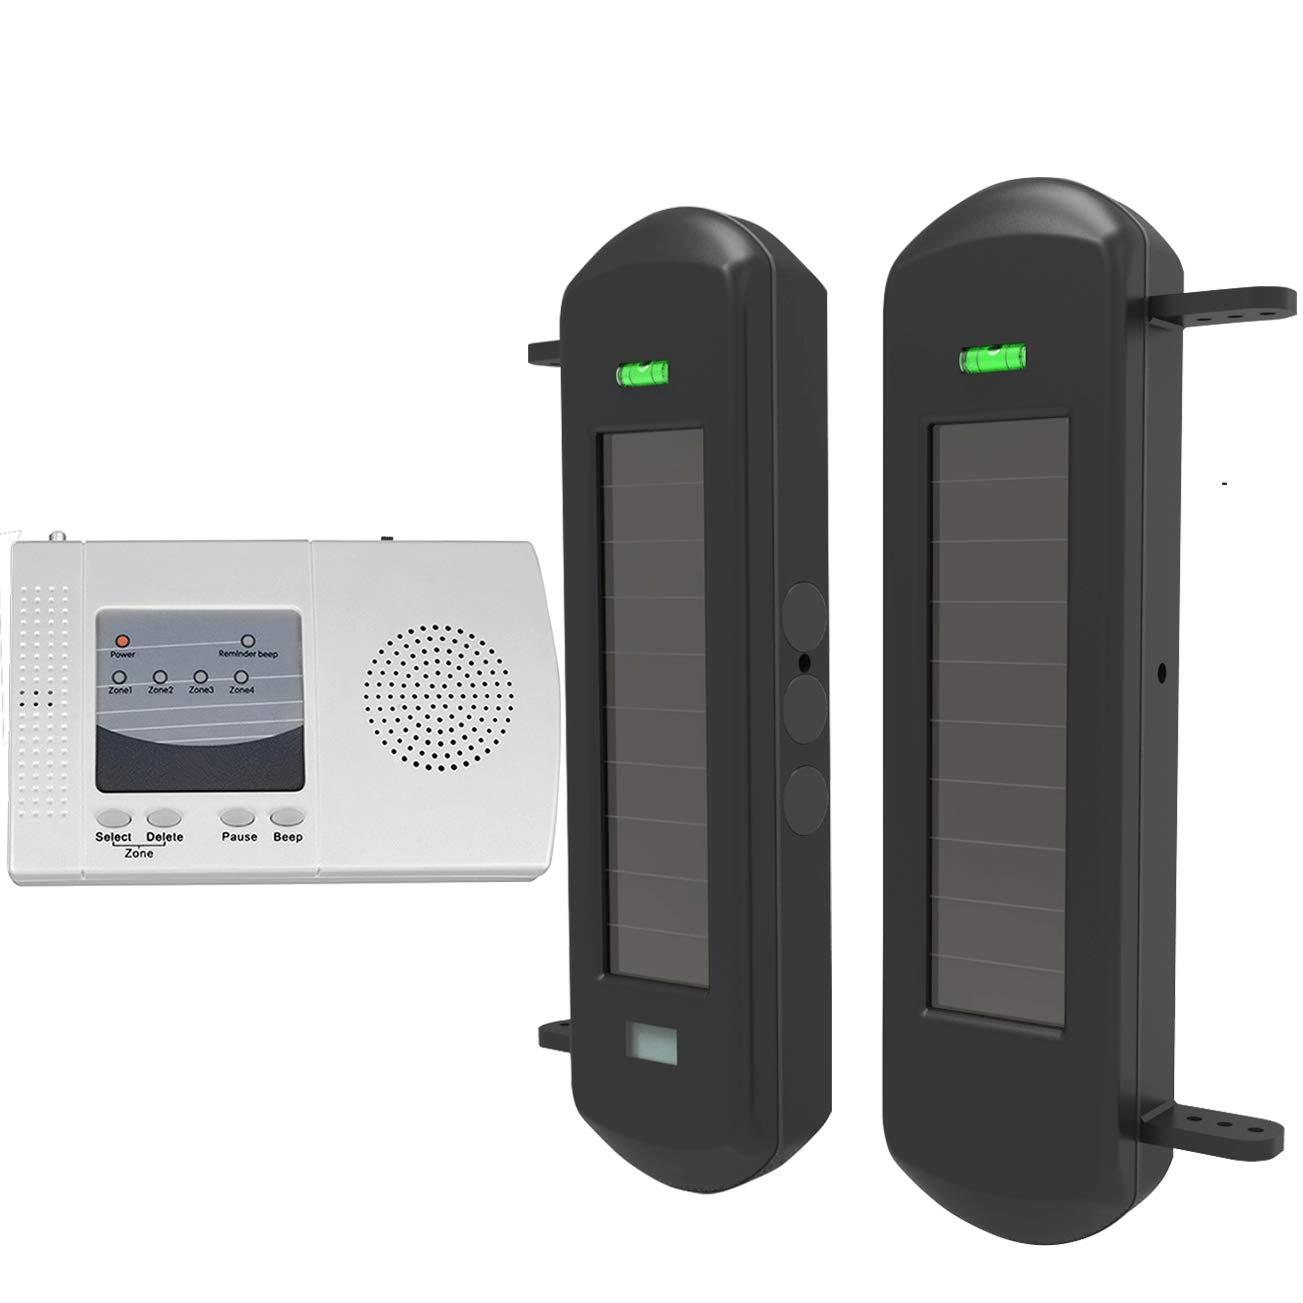 HTZSAFE Solar Wireless Driveway Alarm System-1/2 Mile Long Transmission Range-300 Feet Wide Sensor Range-No Wiring No Need Replace Battery-Outdoor Weatherproof Security Perimeter Alert System KIT by HTZSAFE